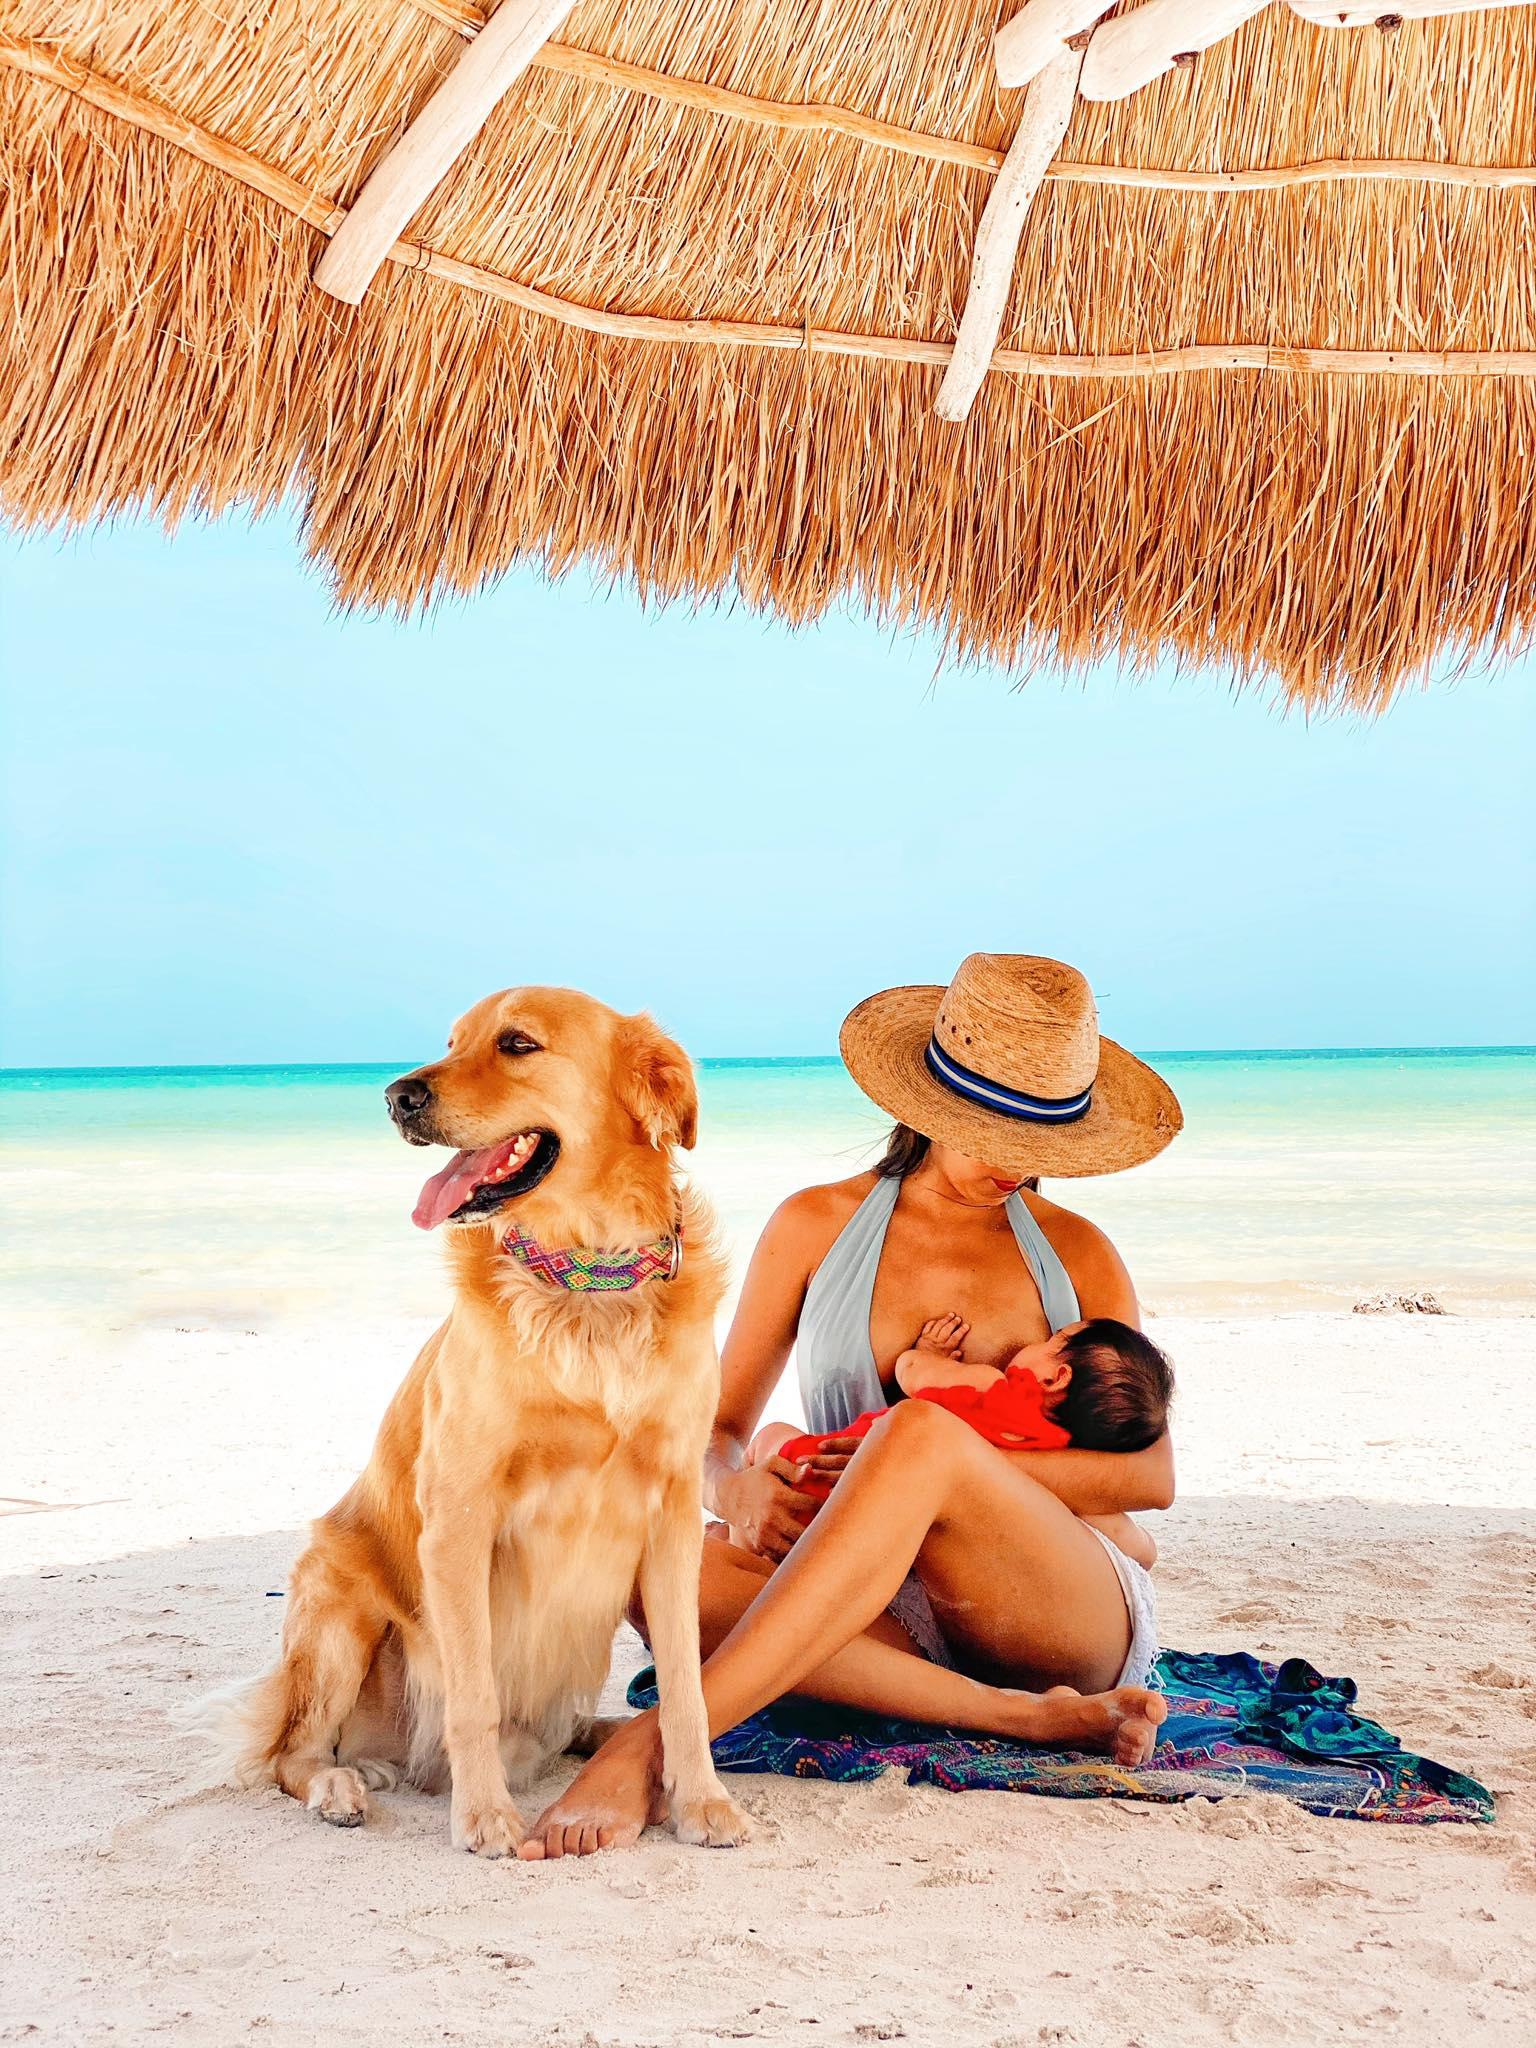 perro holbox perro de isla holbox, dog retriever from holbox murph murphy